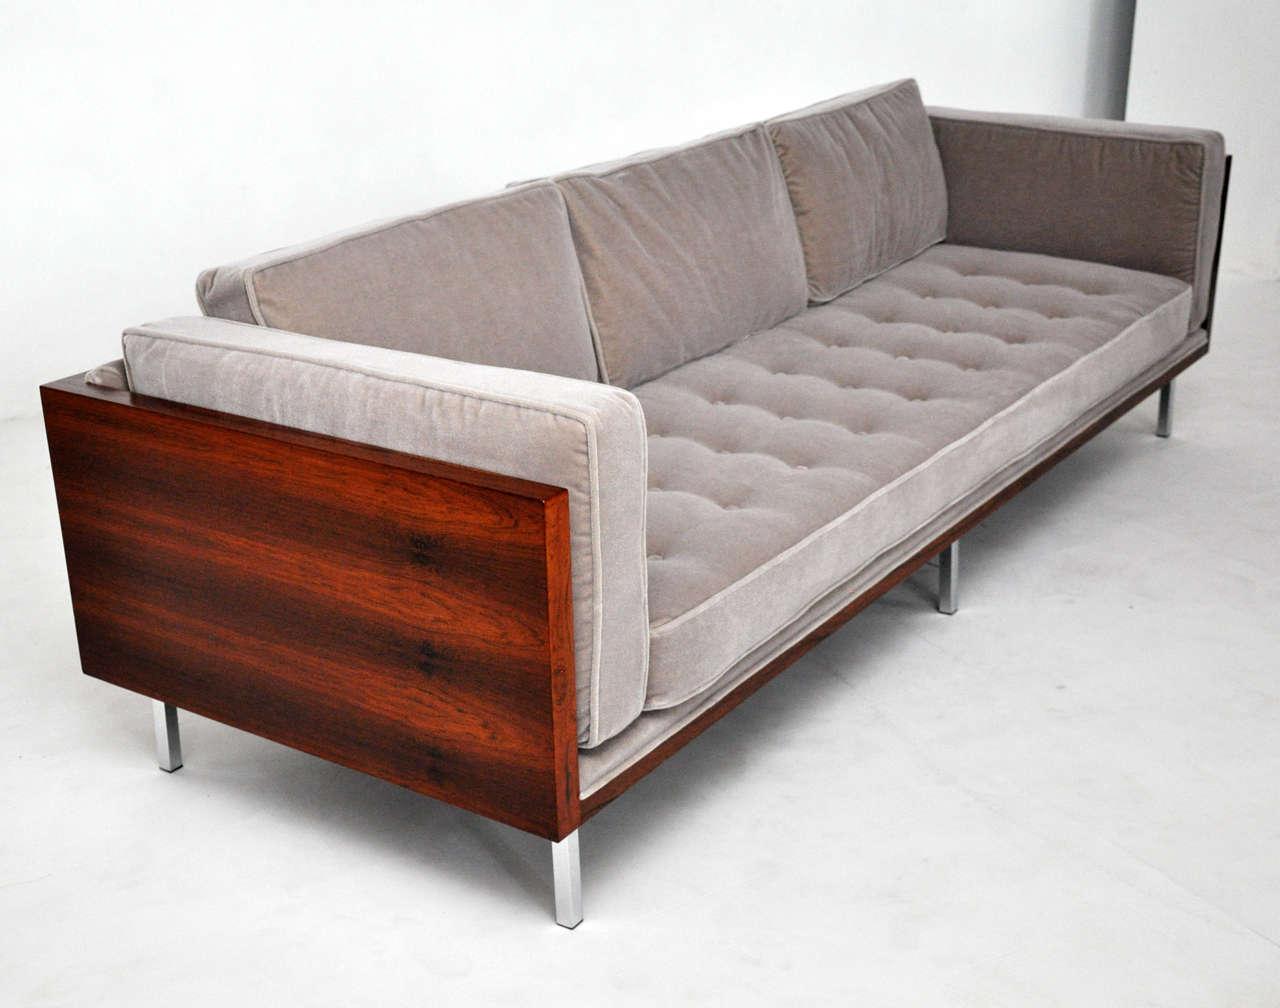 Nice 8ft Rosewood Case Sofa By Milo Baughman. Fully Restored. Beautiful Rosewood  Wood Grain.